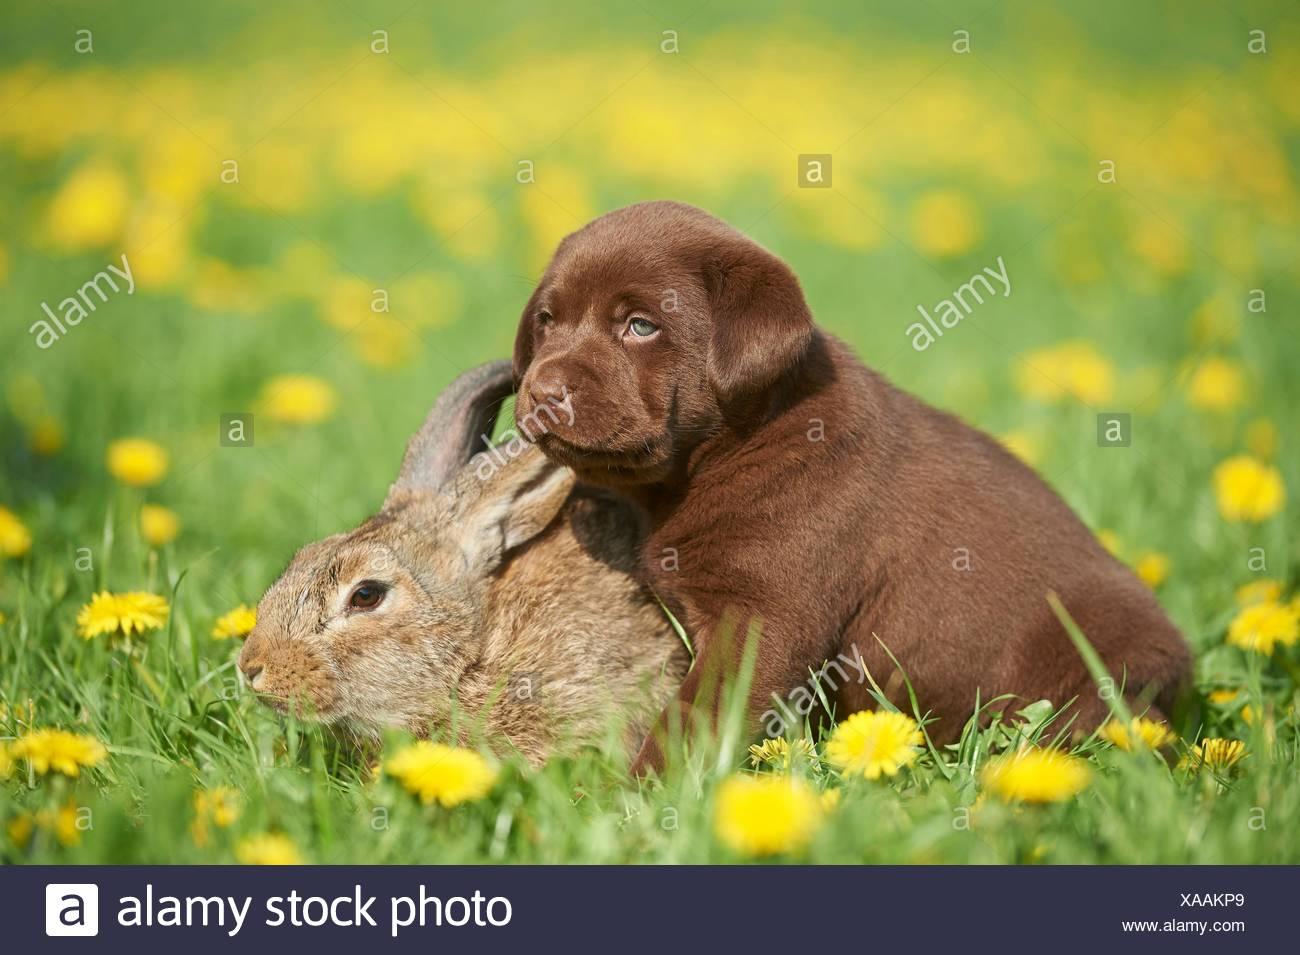 Labrador puppy and rabbit, Upper Palatinate, Bavaria, Germany, Europe - Stock Image